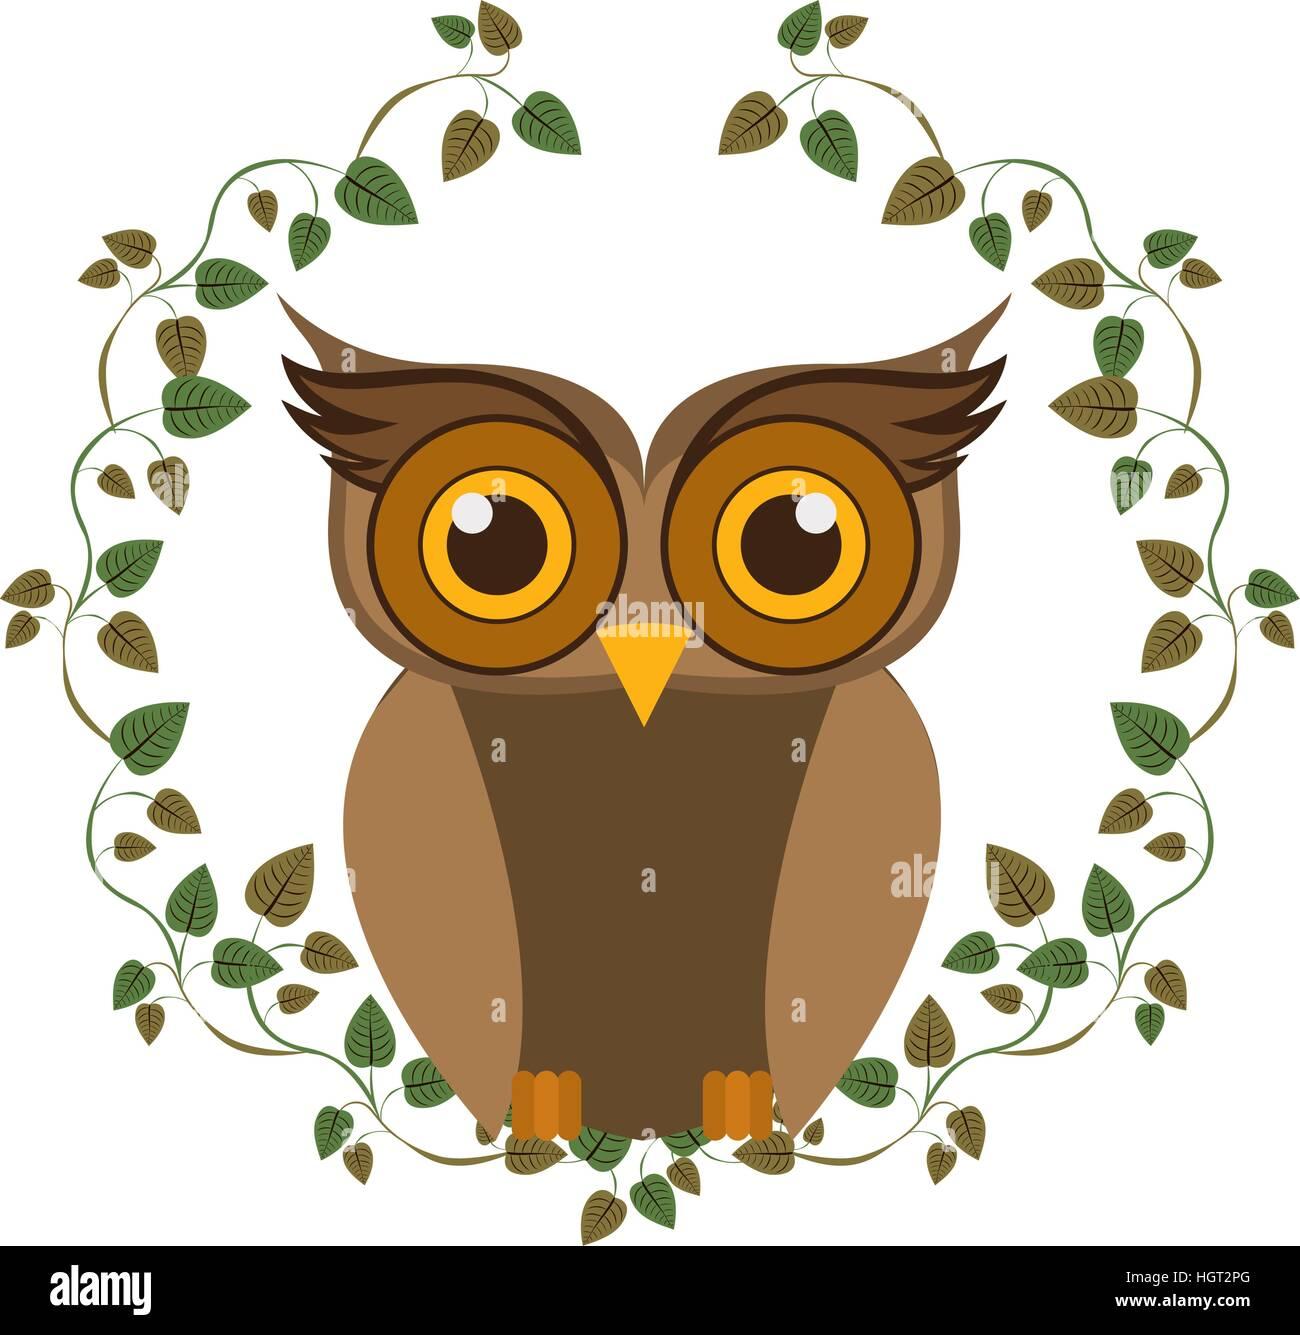 owl cartoon icon bird animal and nature theme isolated design